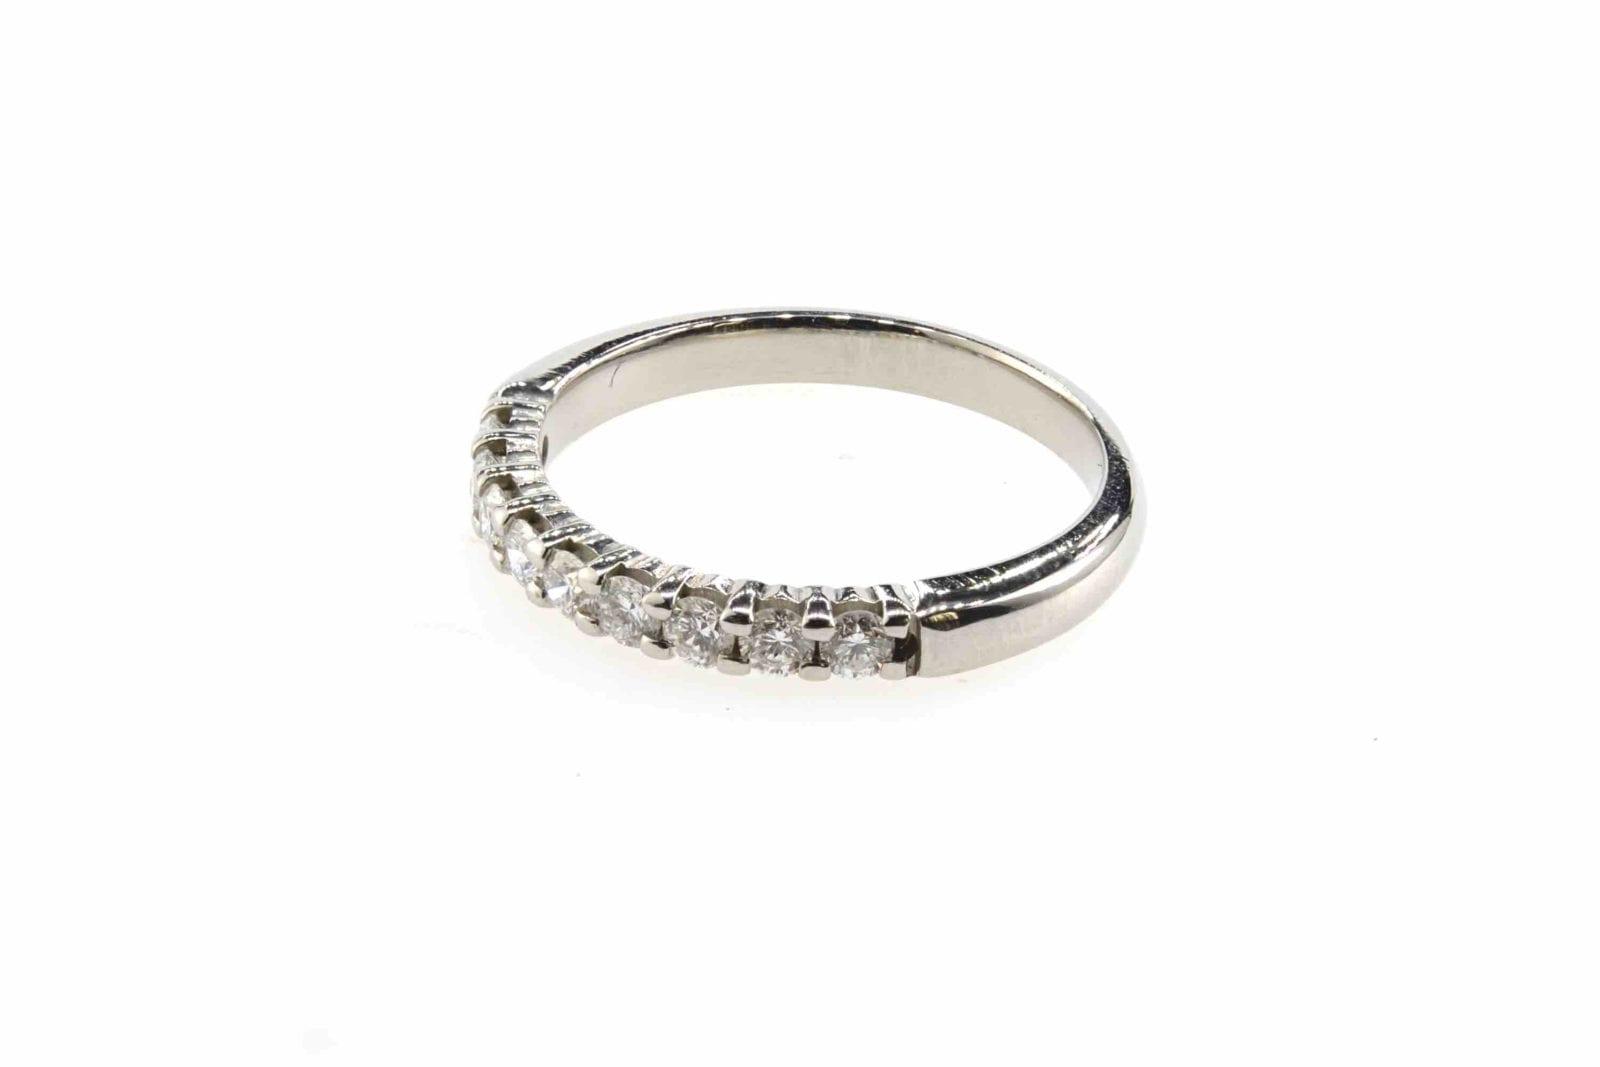 Alliance diamants demi-tour en or blanc 18k